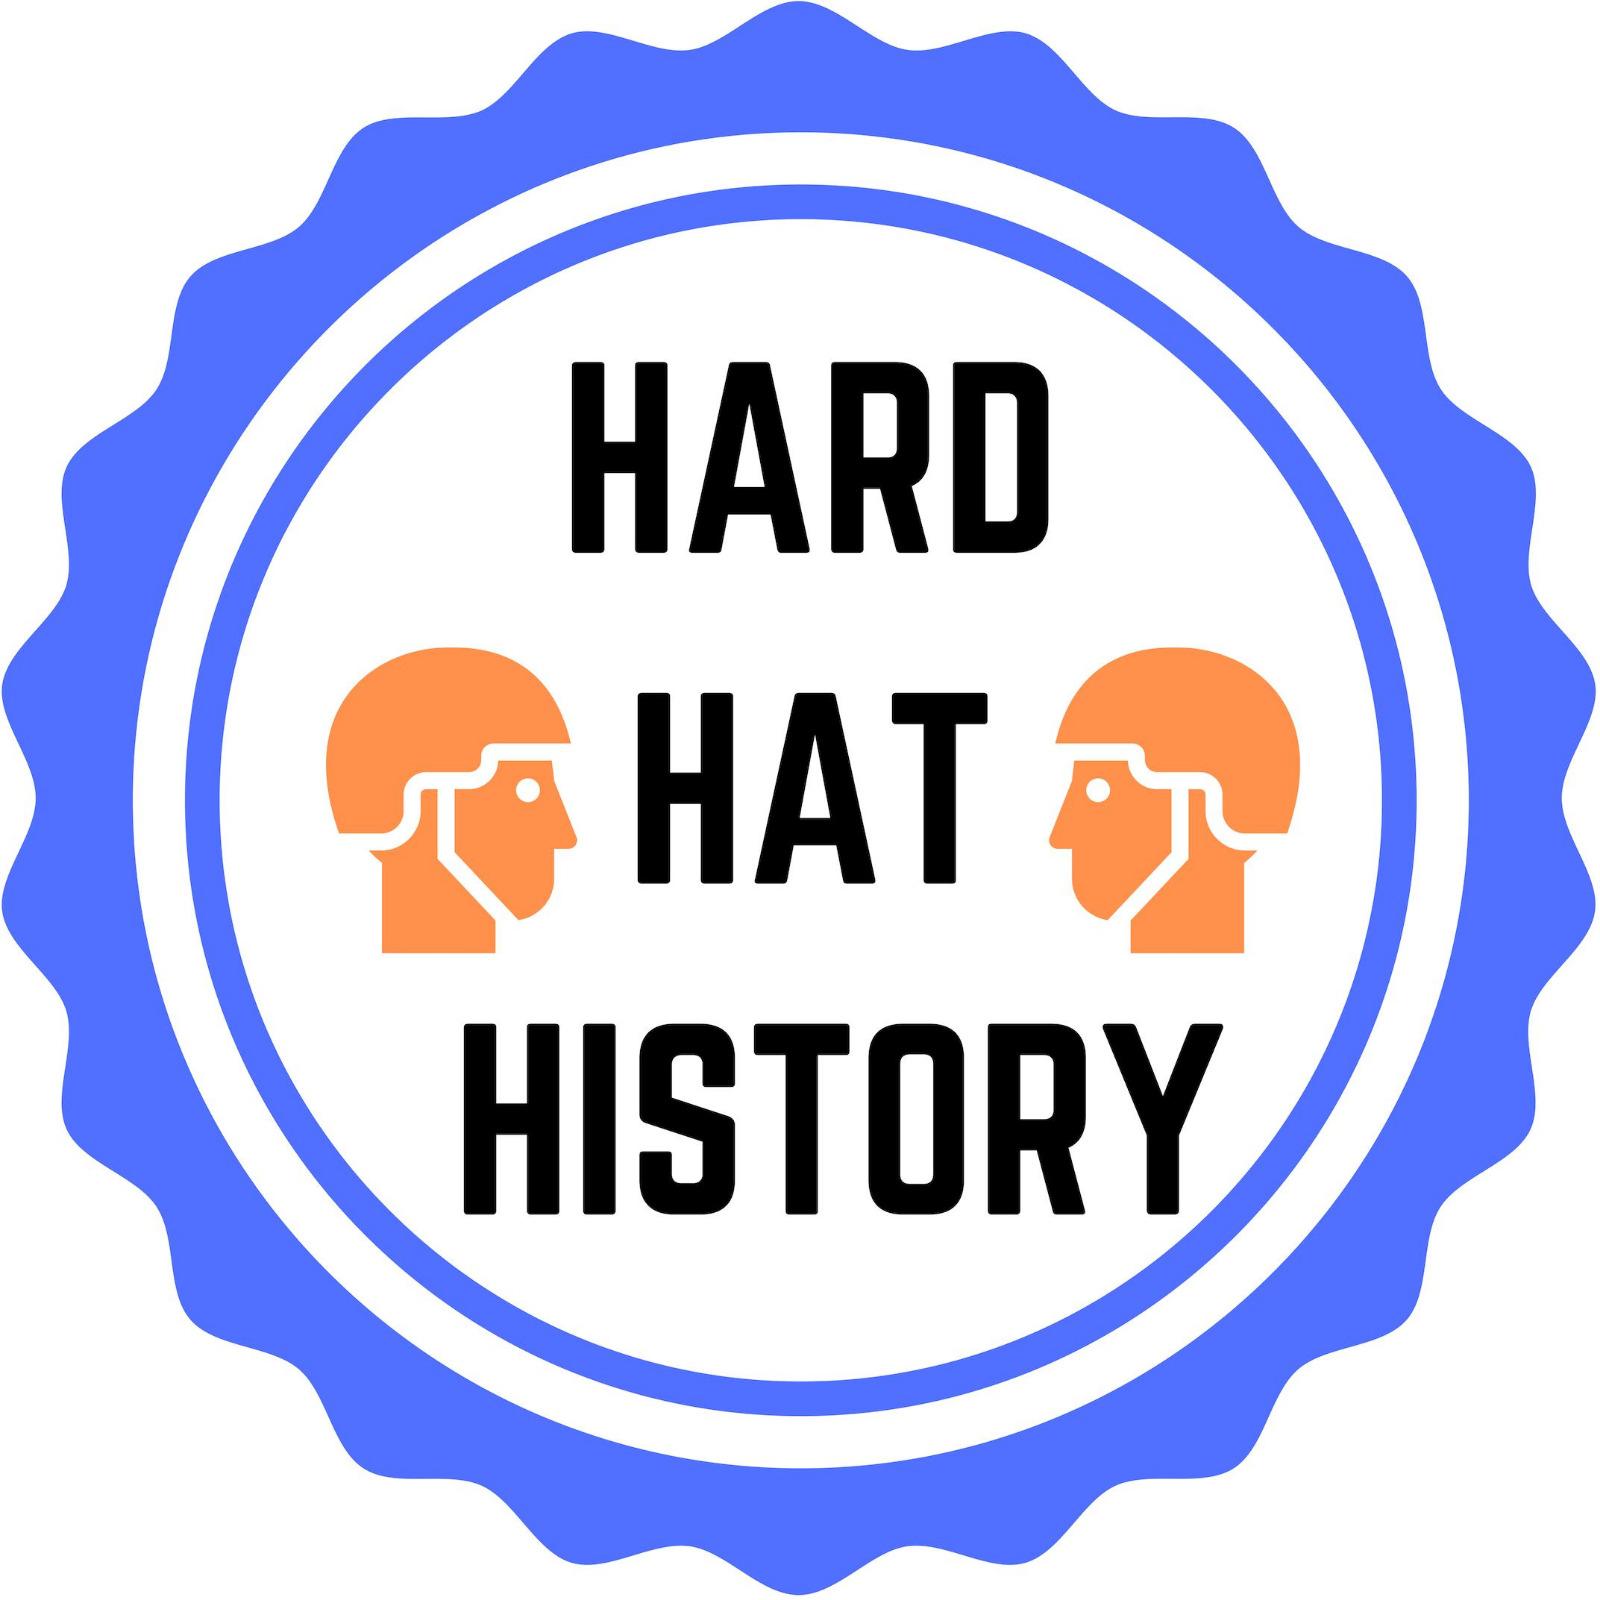 Hard Hat History